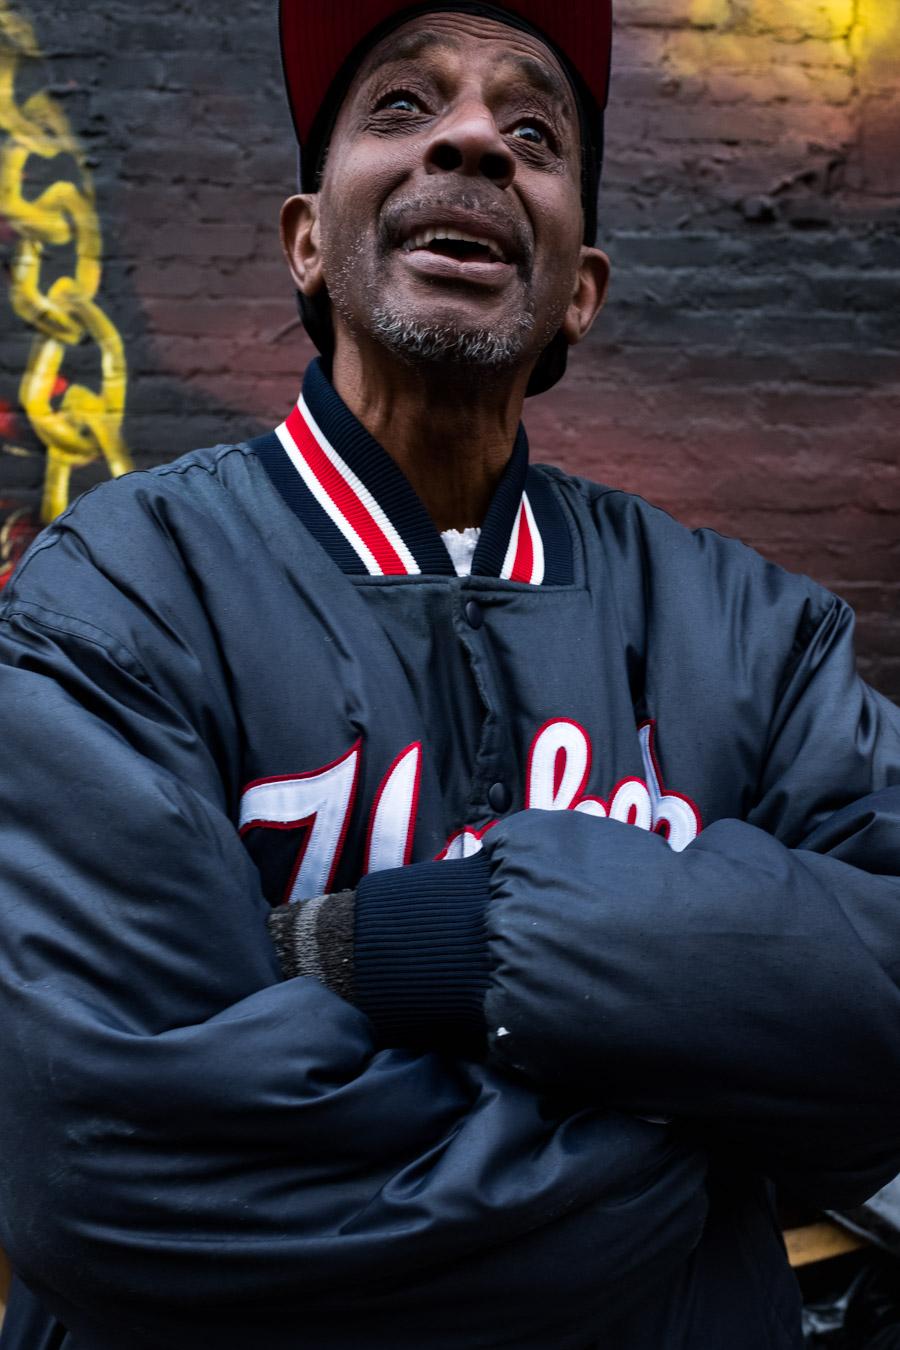 new-york_street_portraits-hamburg-fotograf-filipp-romanovskij (1 von 1)